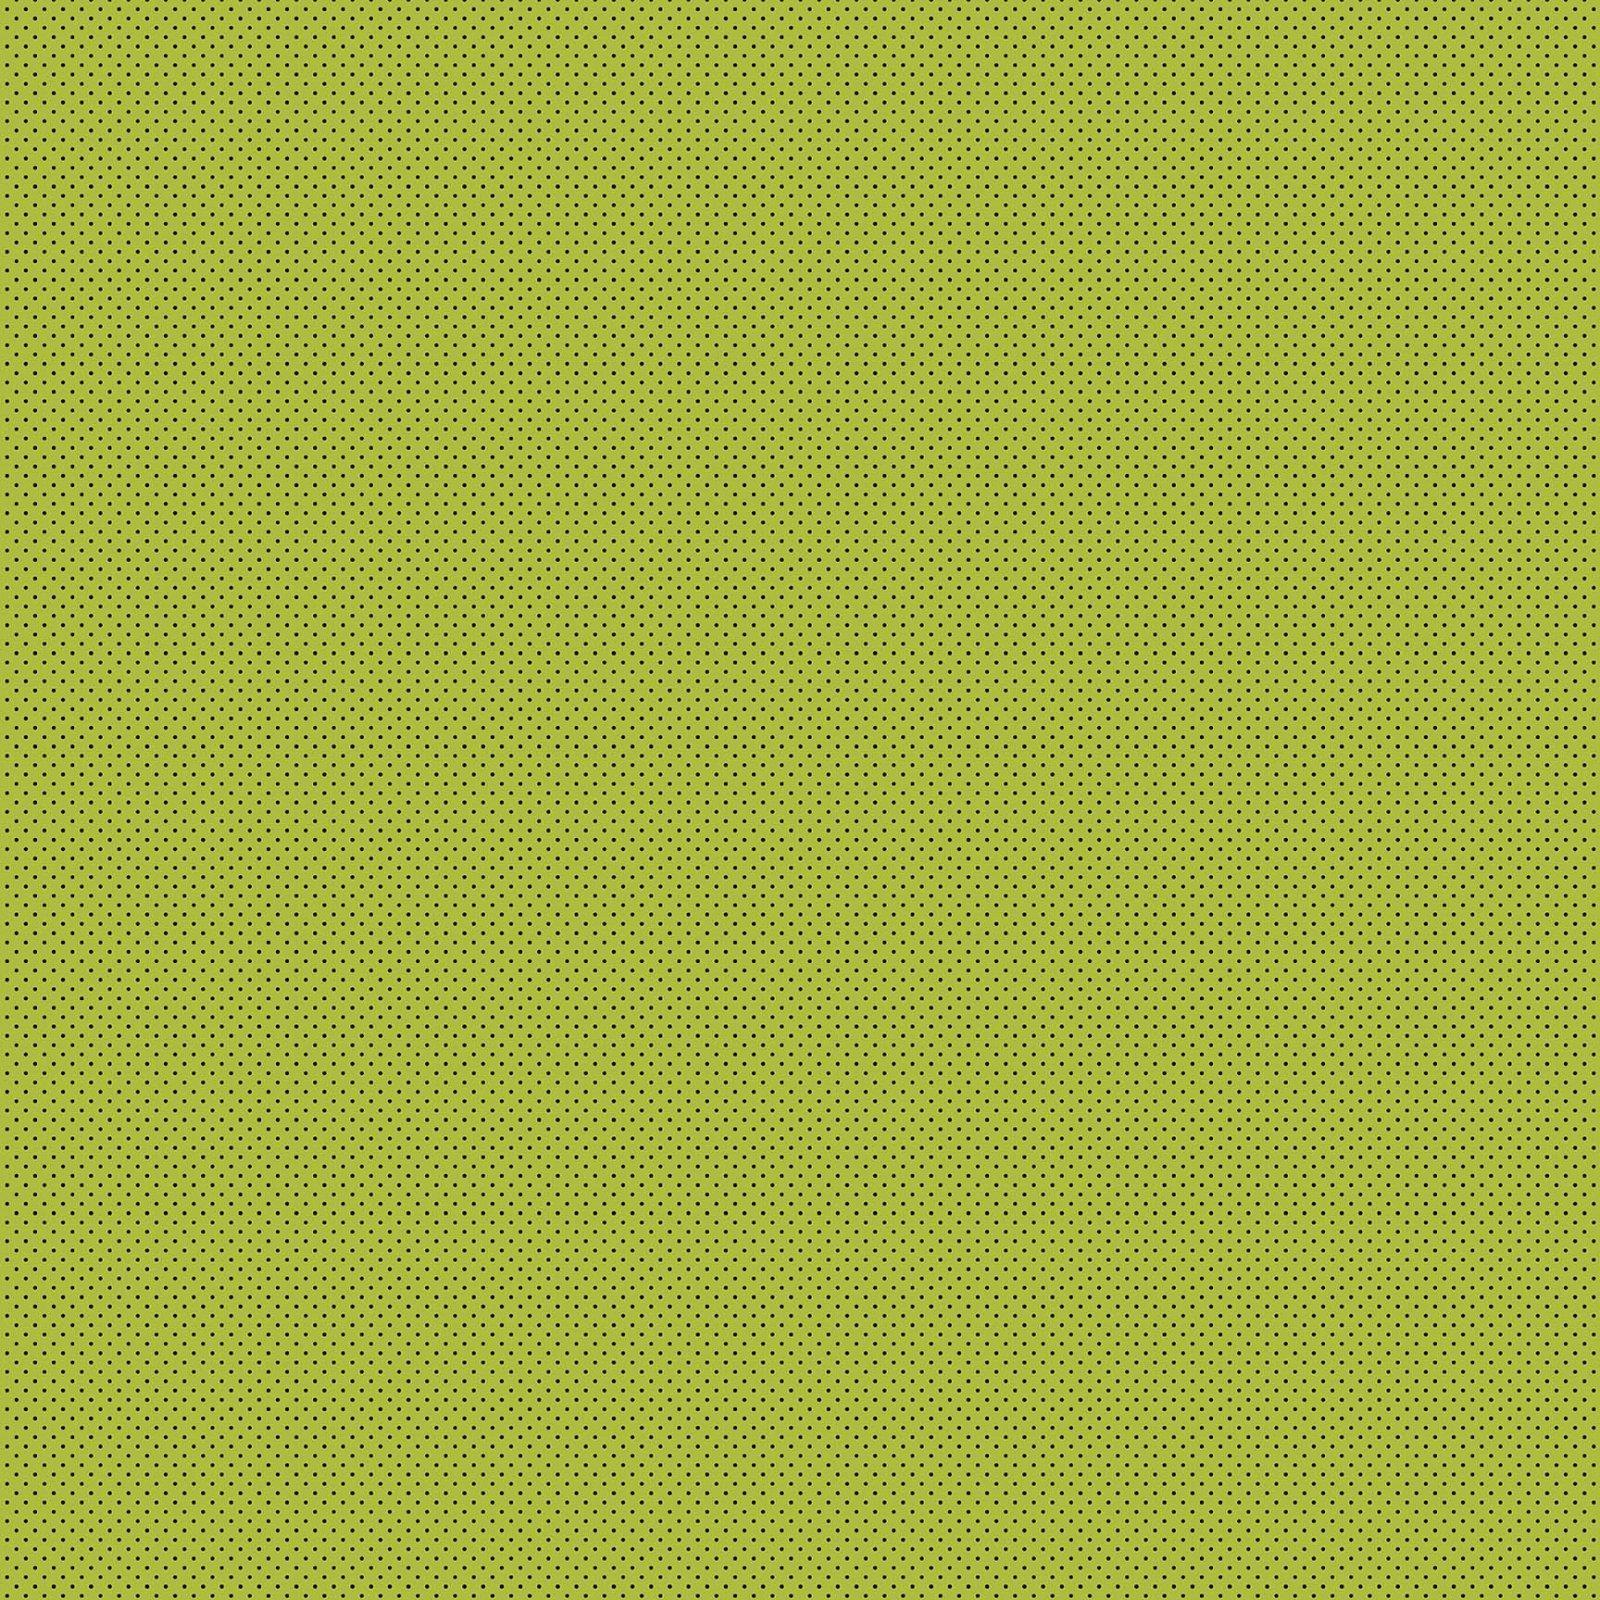 Urban Elementz Green with Black Pin Dot